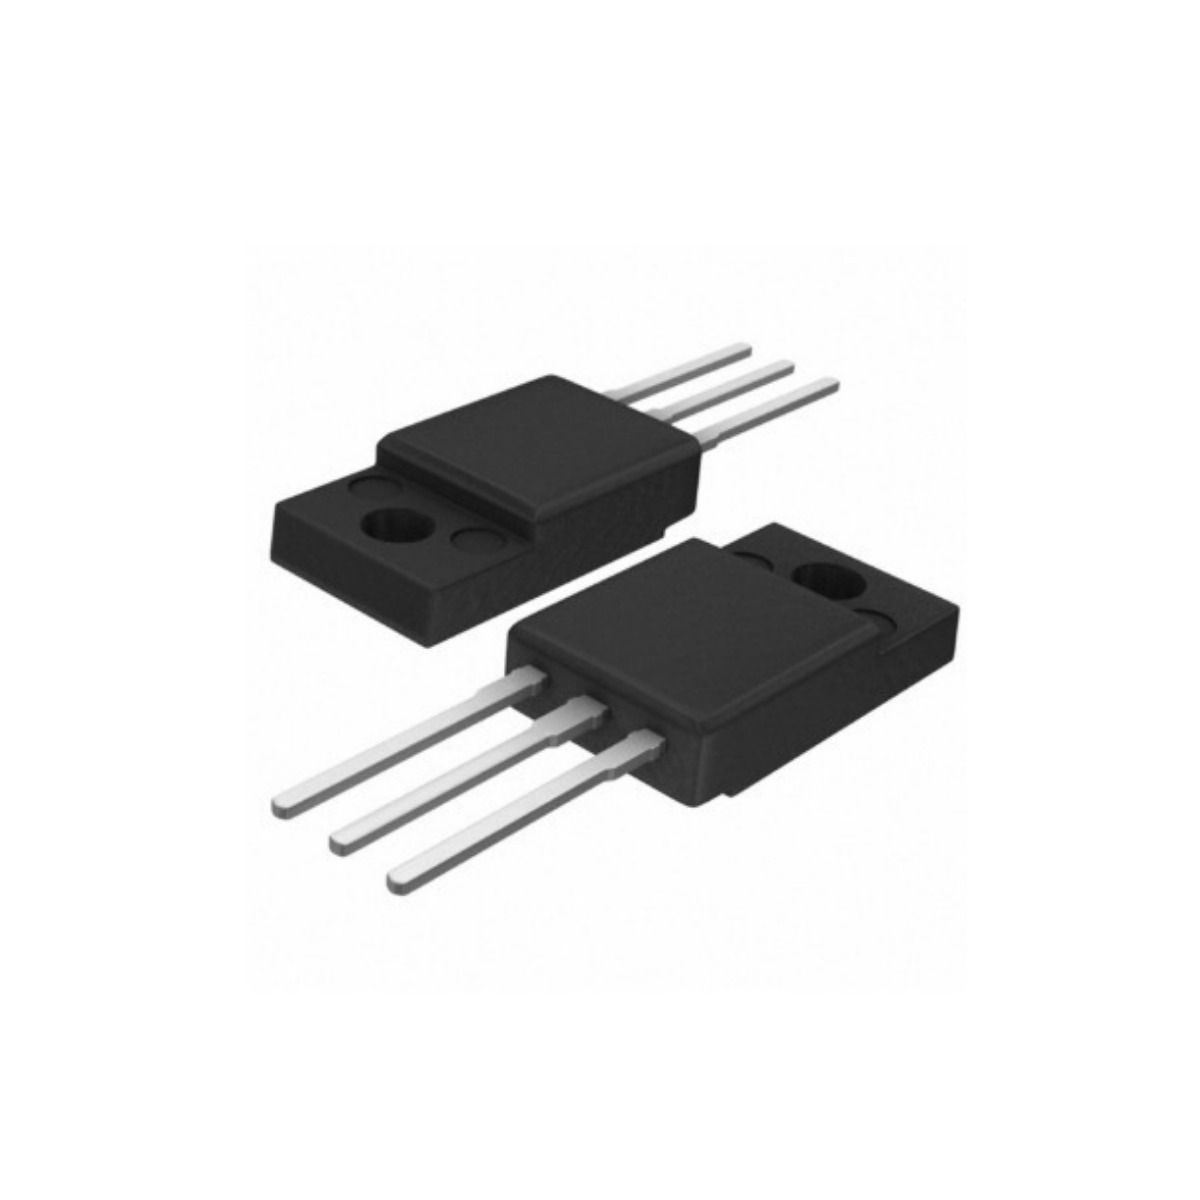 10 peças Transistor Mosfet IPD09N03L Infineon Mosfet Dpak